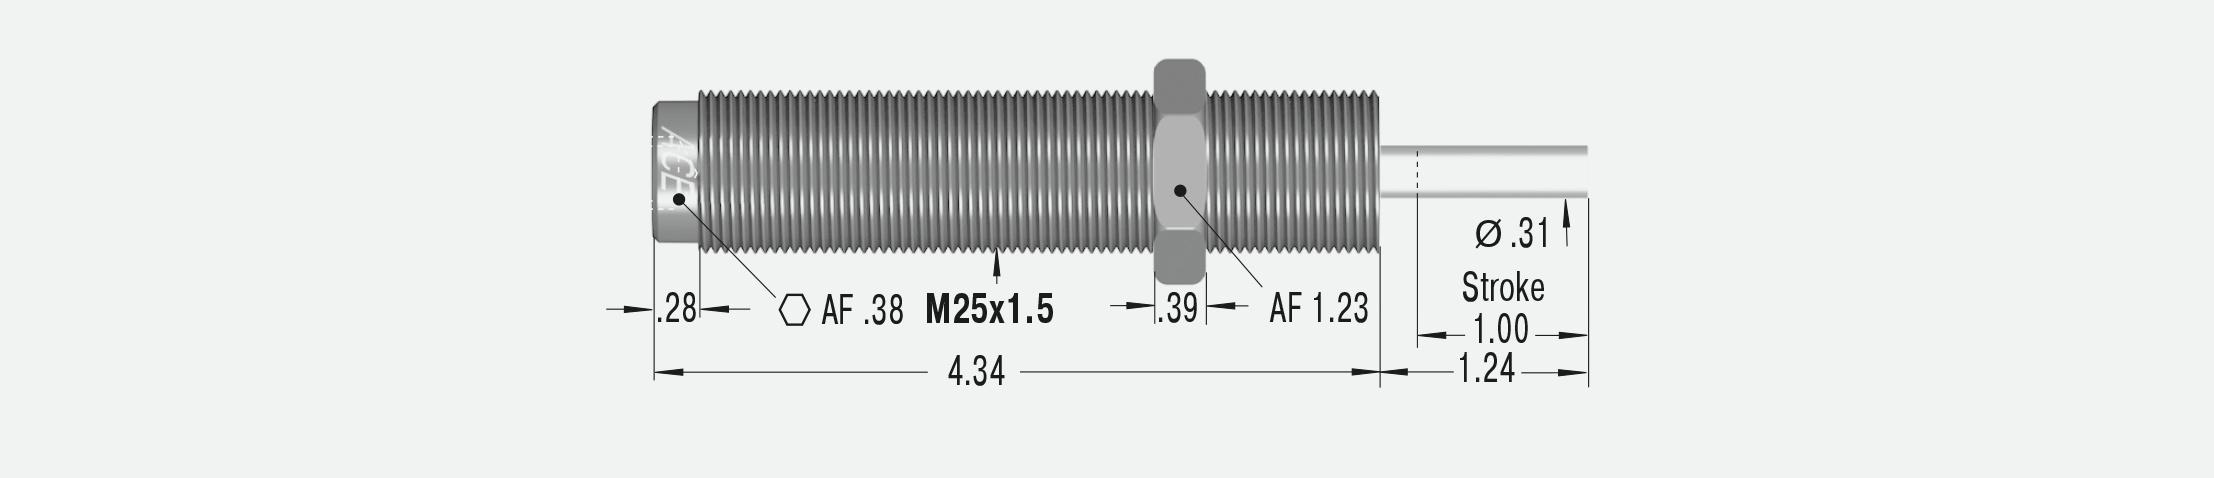 MC600MH-V4A